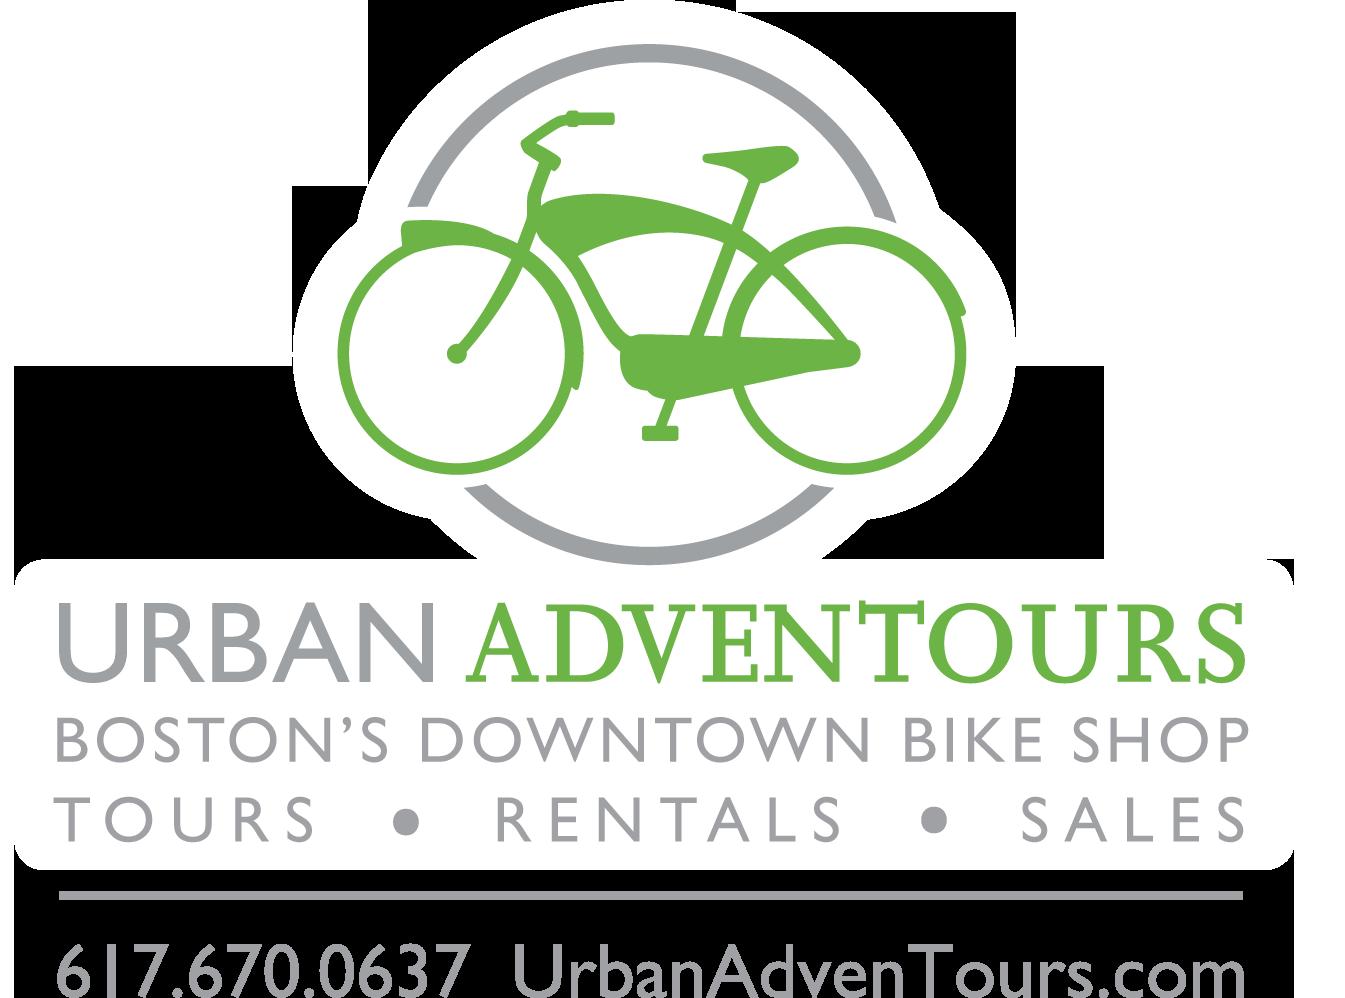 Urban Adventours